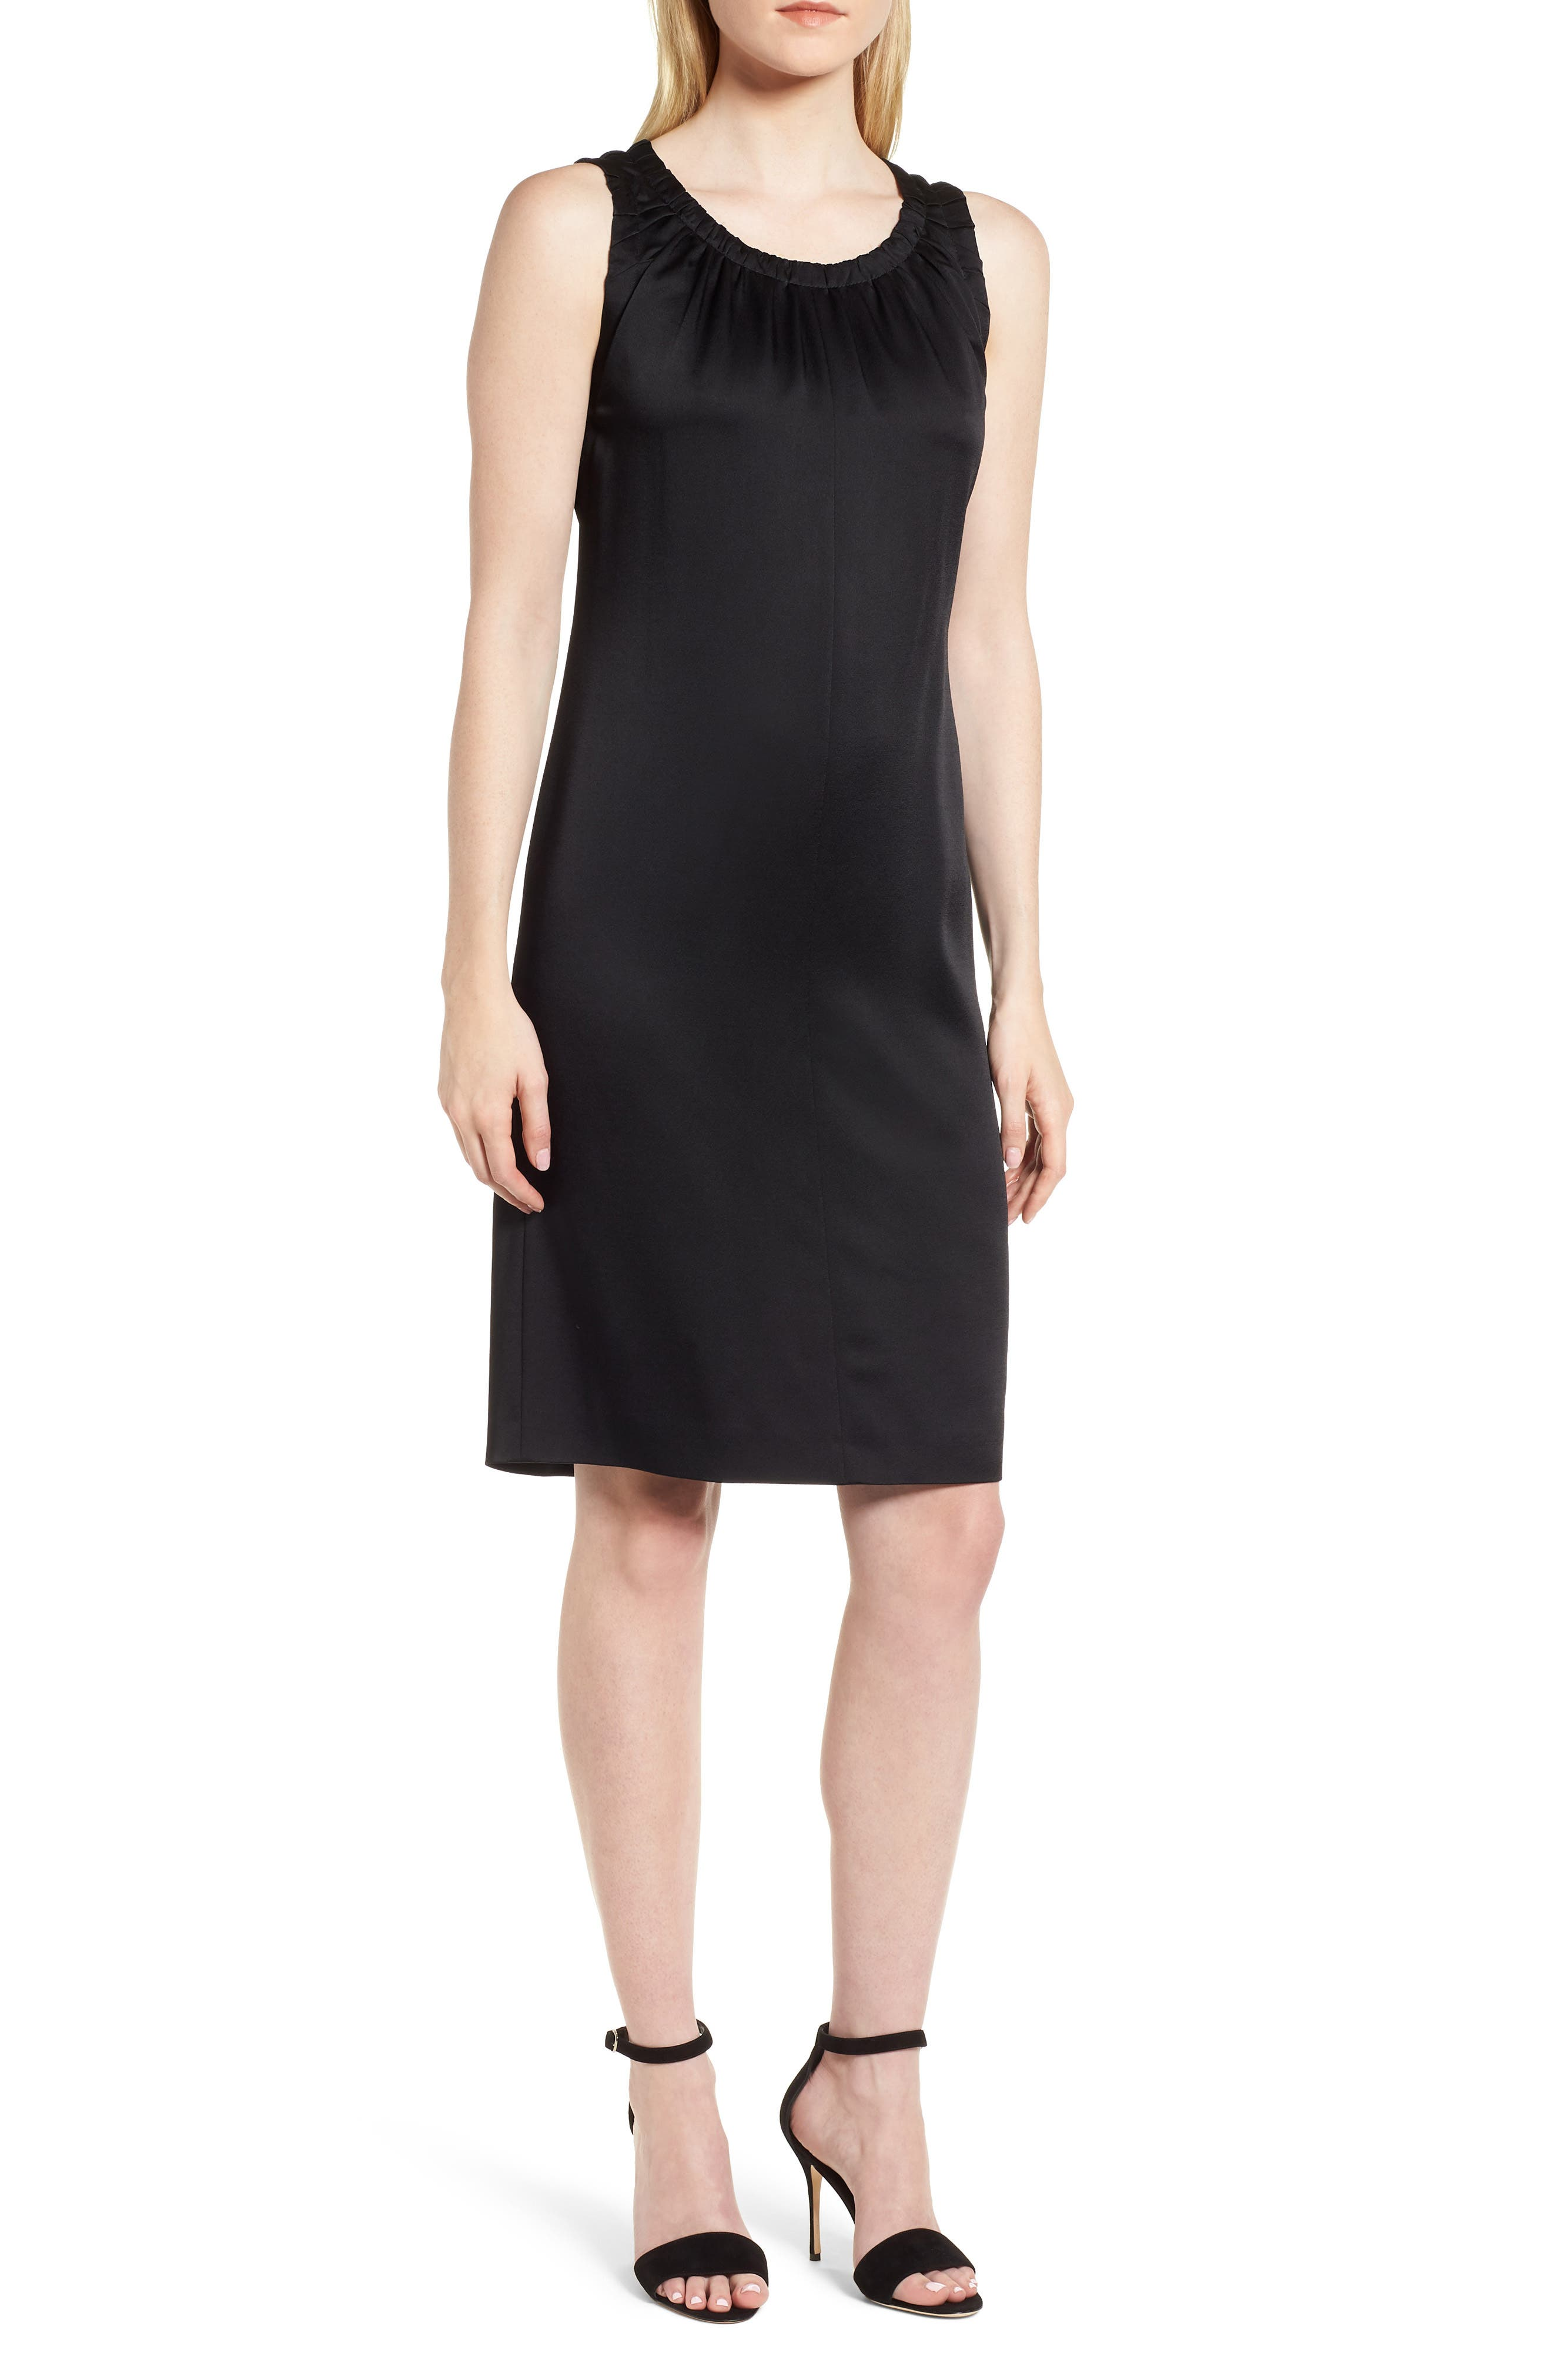 Daviana Sheath Dress,                             Main thumbnail 1, color,                             001